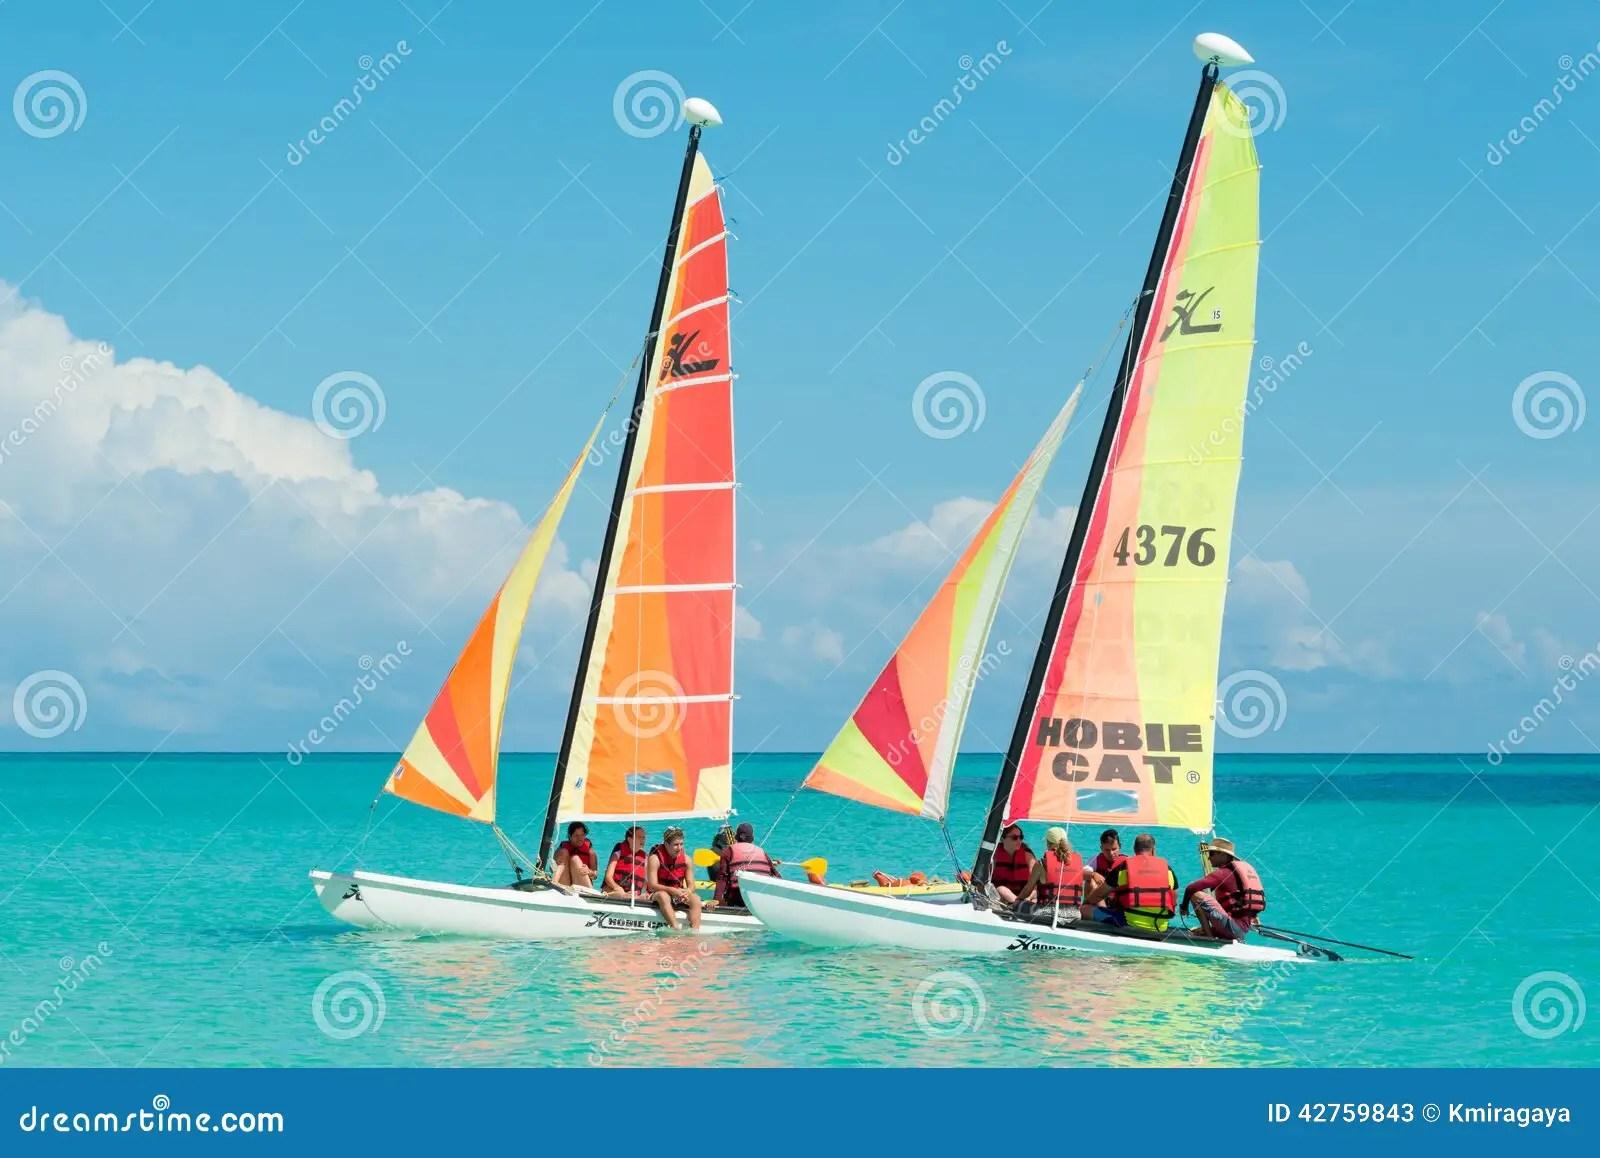 Tourists Sailing In Cayo Santa Maria In Cuba Editorial